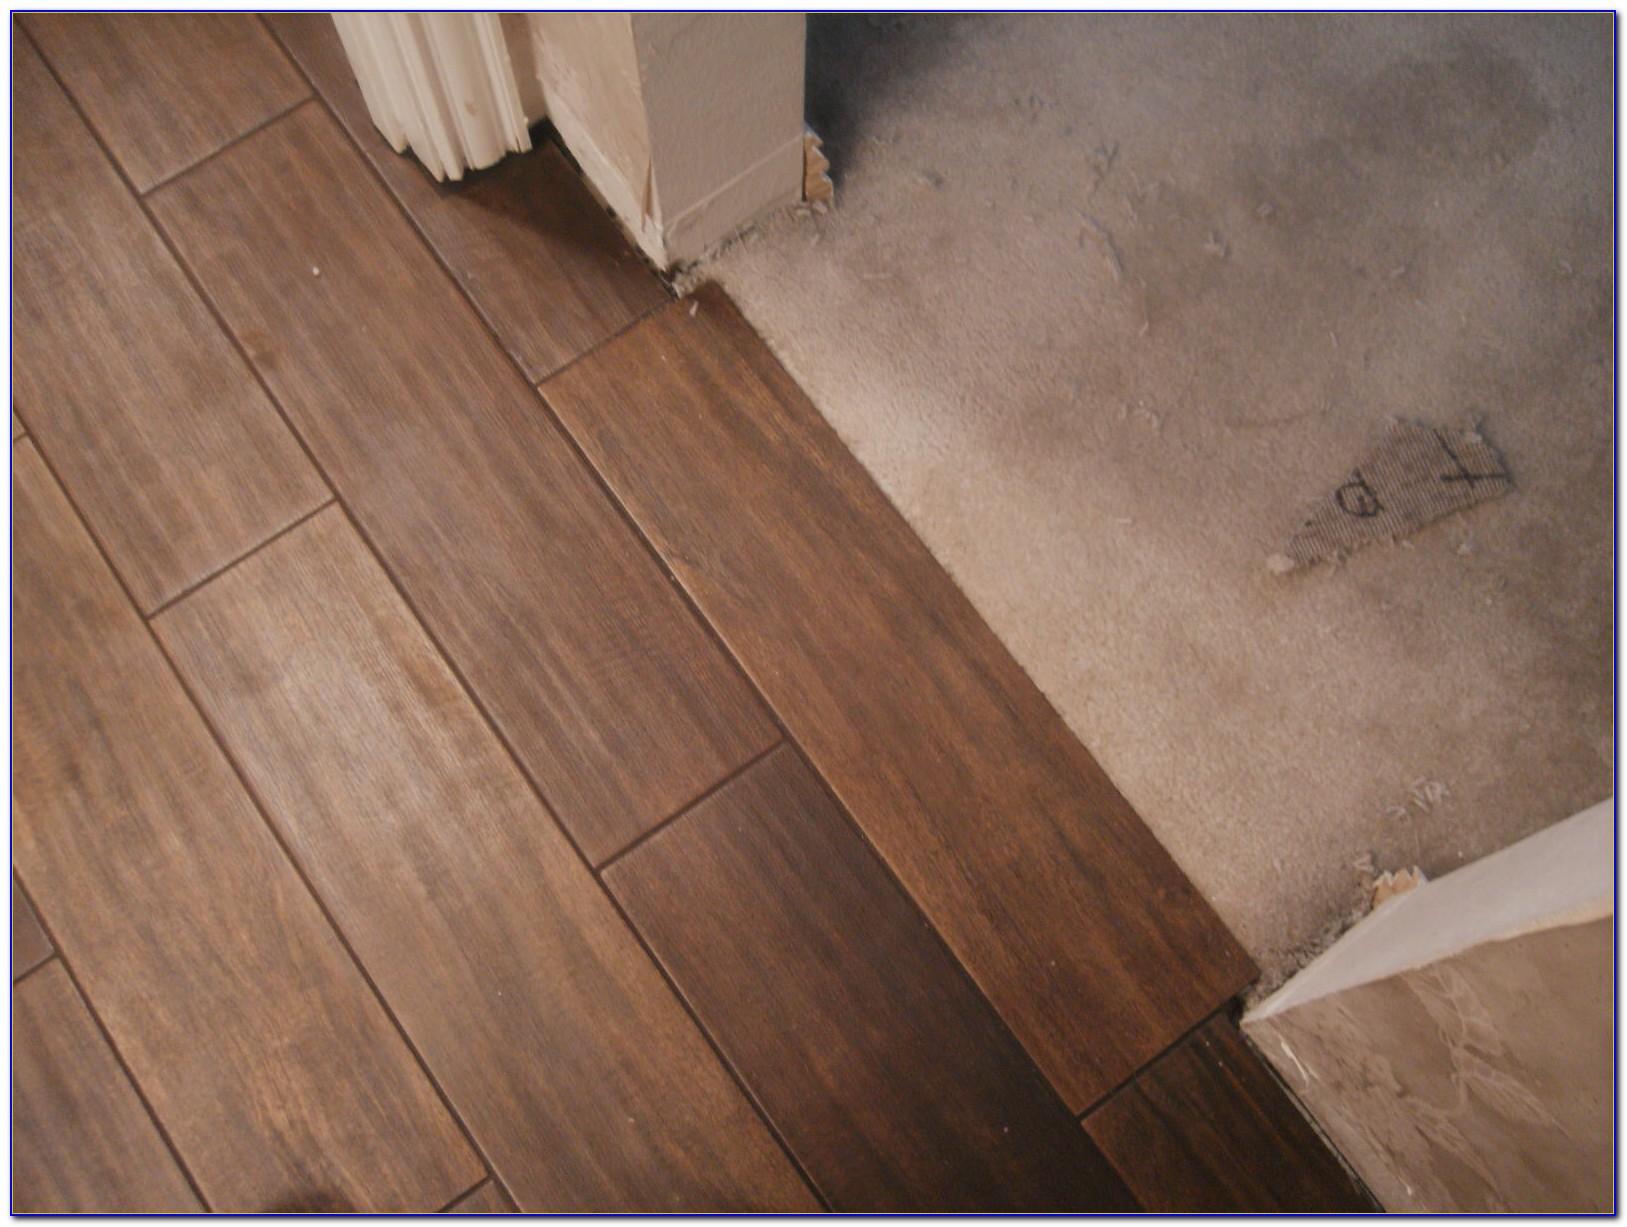 Ceramic Tiles That Look Like Hardwood Floors